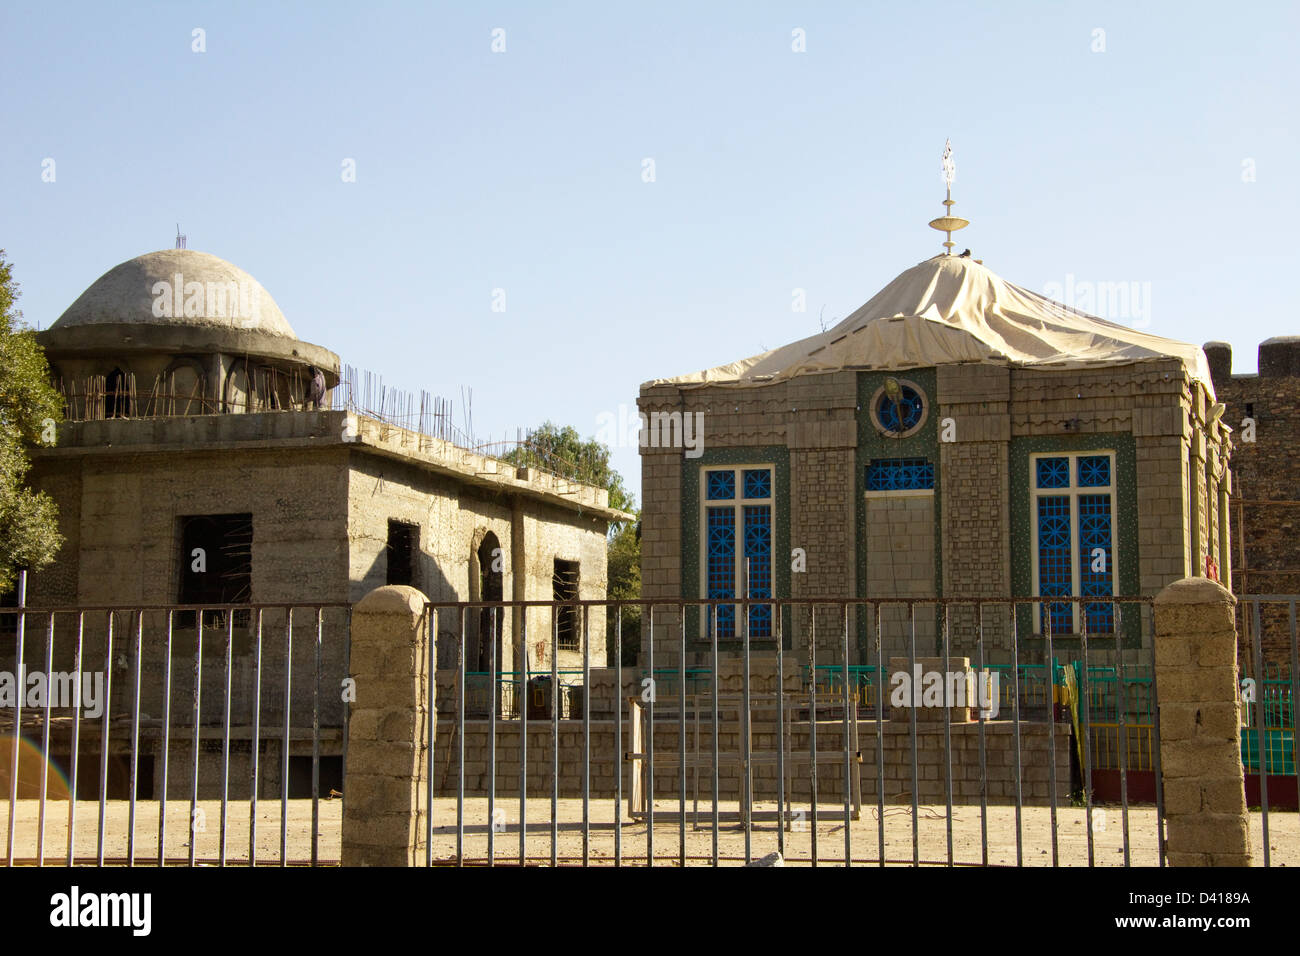 Ark of the covenant chapel axum ethiopia africa stock photo ark of the covenant chapel axum ethiopia africa publicscrutiny Images